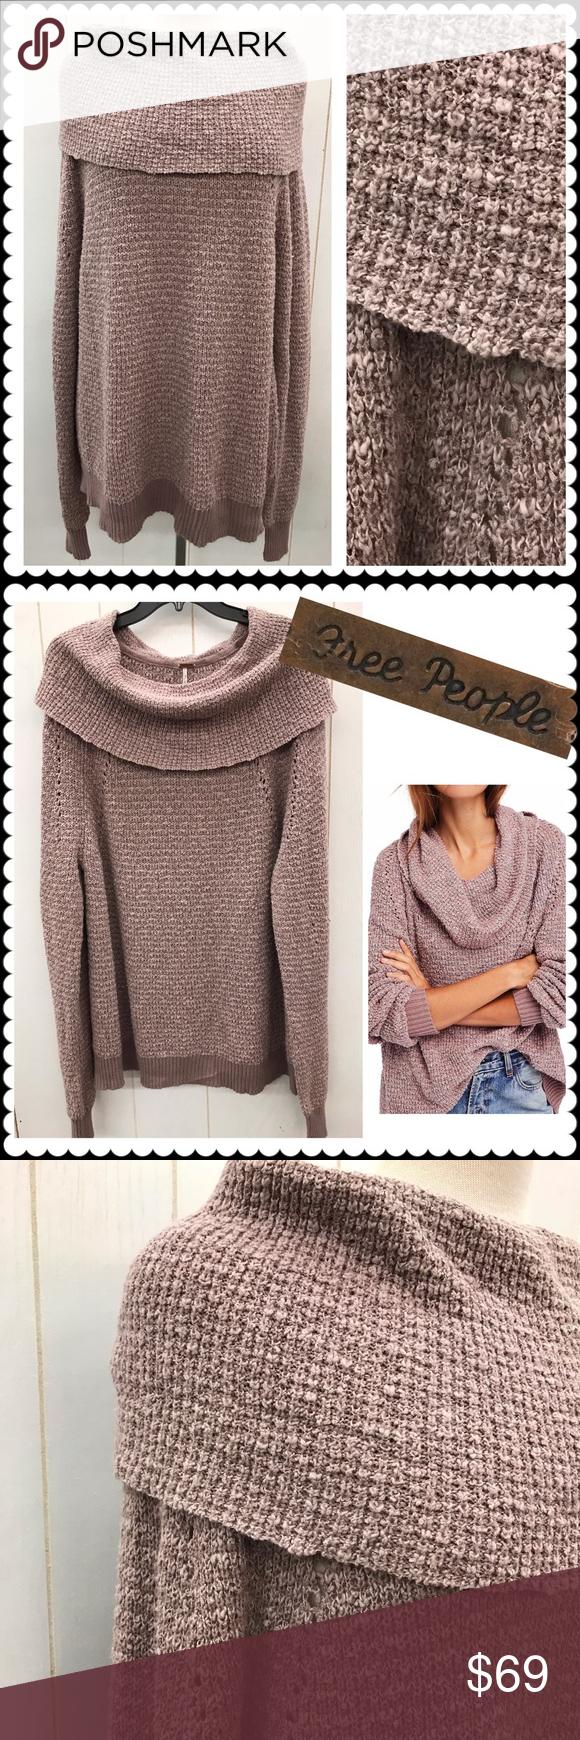 Free People Cowl Neck Oversized Sweater New Nwt My Posh Picks